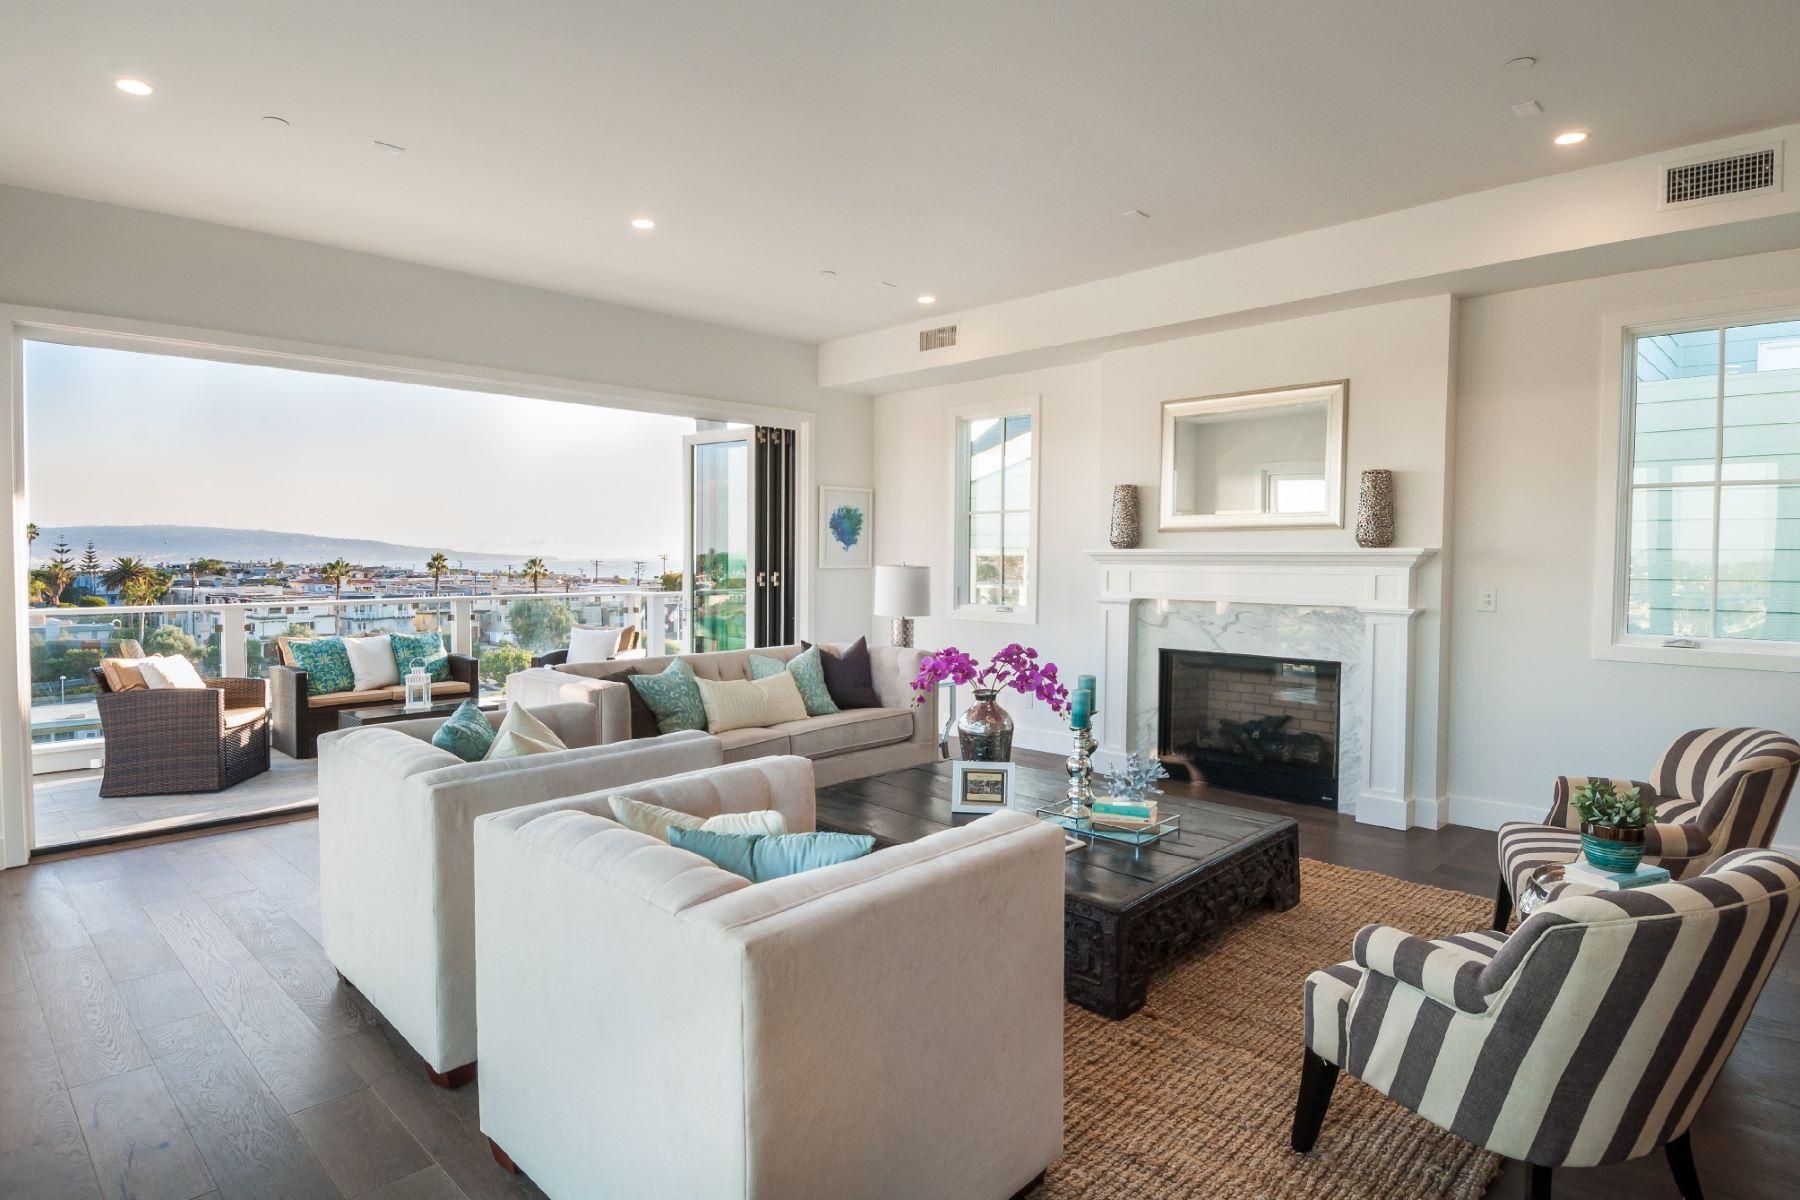 Villa per Vendita alle ore 2600 Grandview Ave Manhattan Beach, California, 90266 Stati Uniti